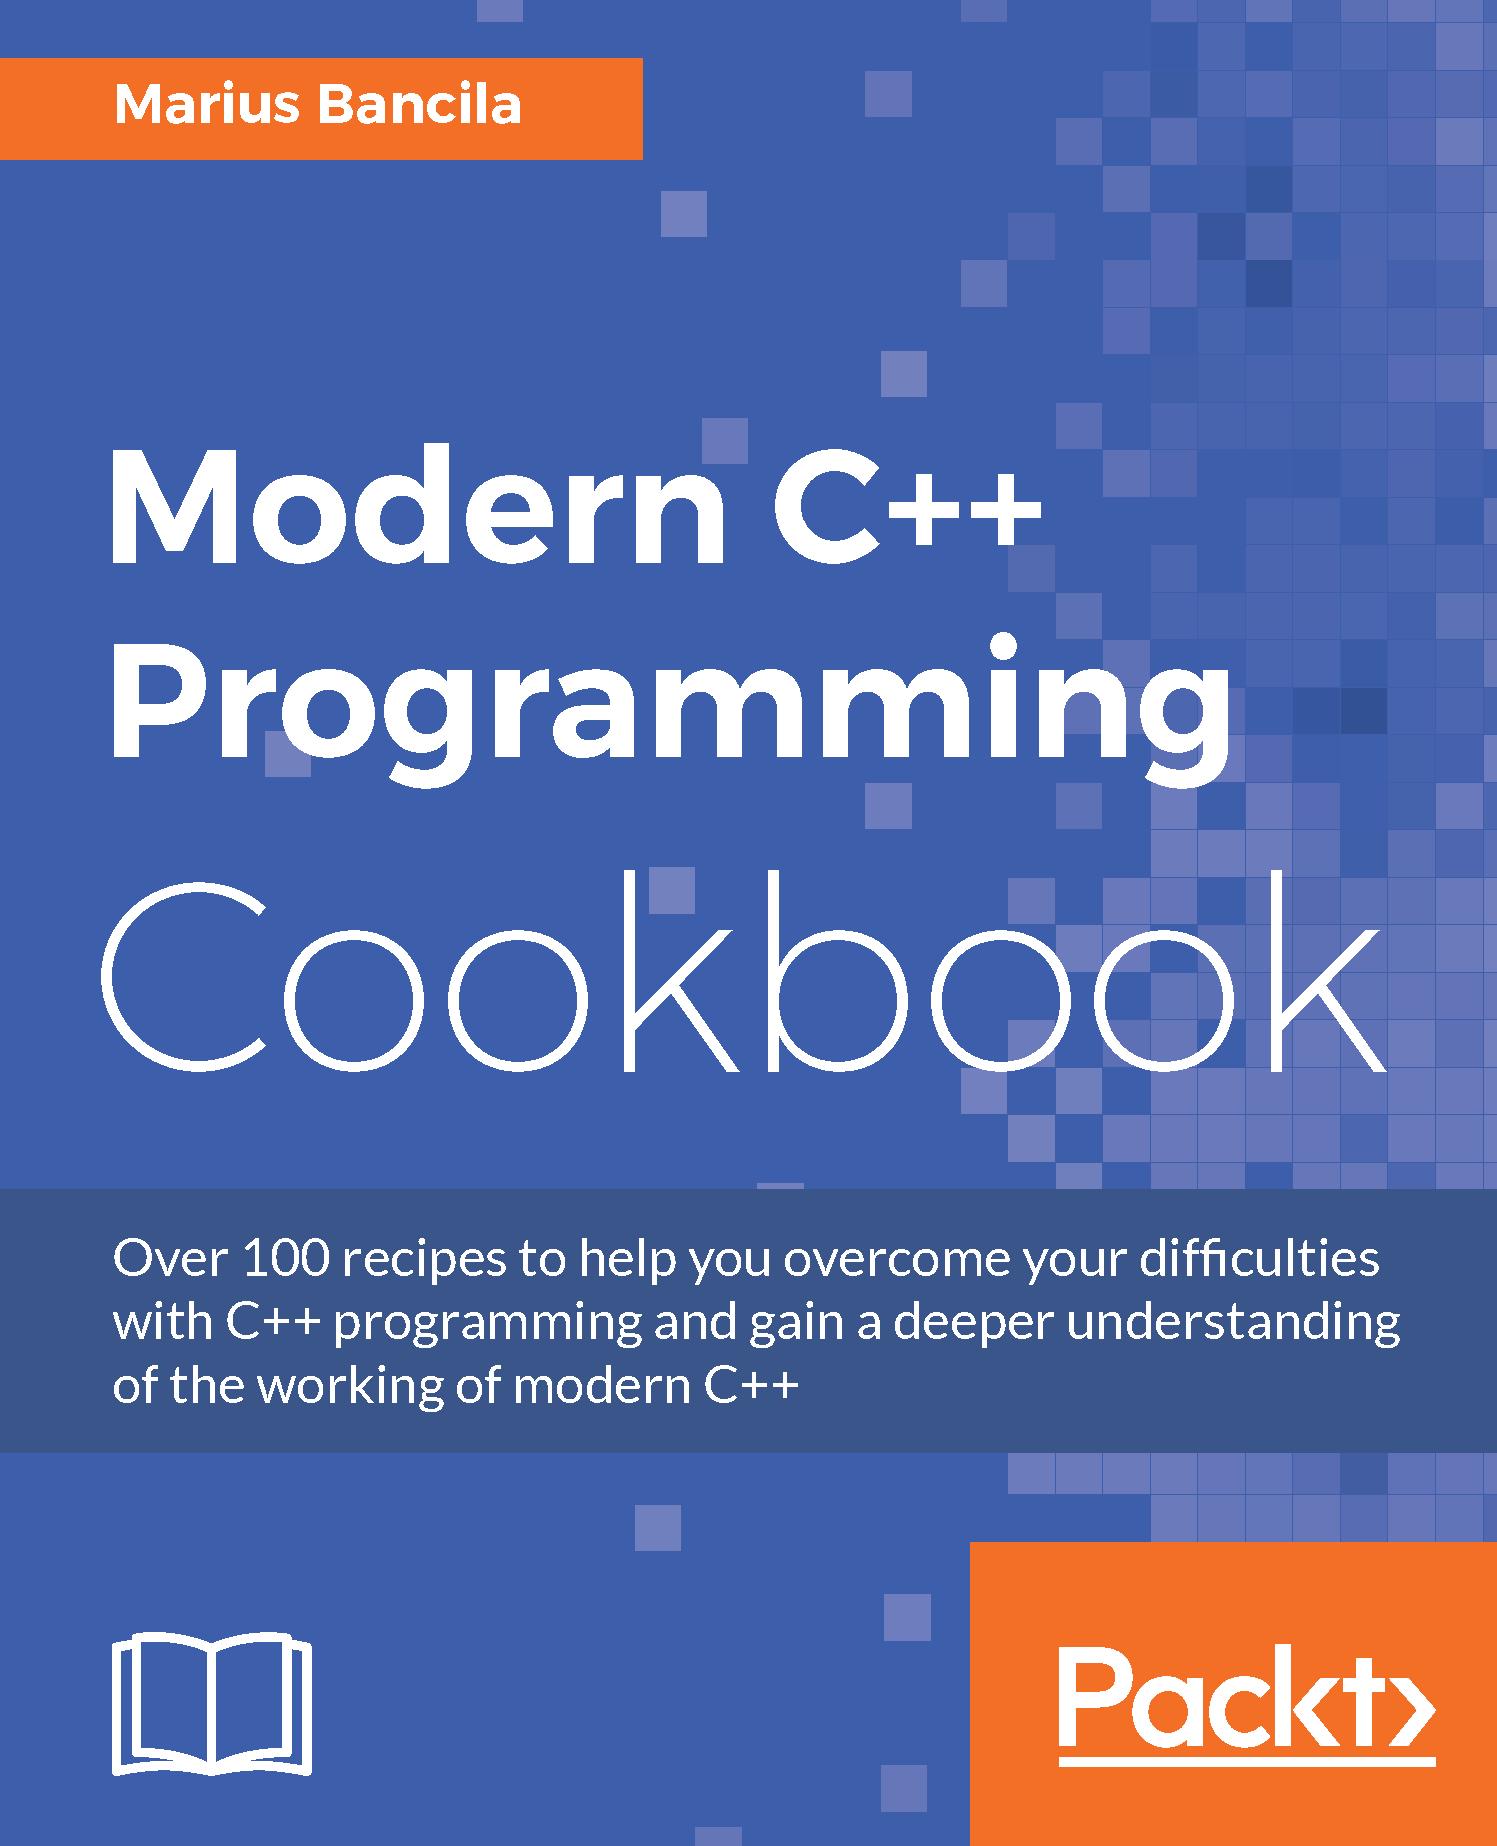 Modern C++ Programming Cookbook (eBook) kostenlos